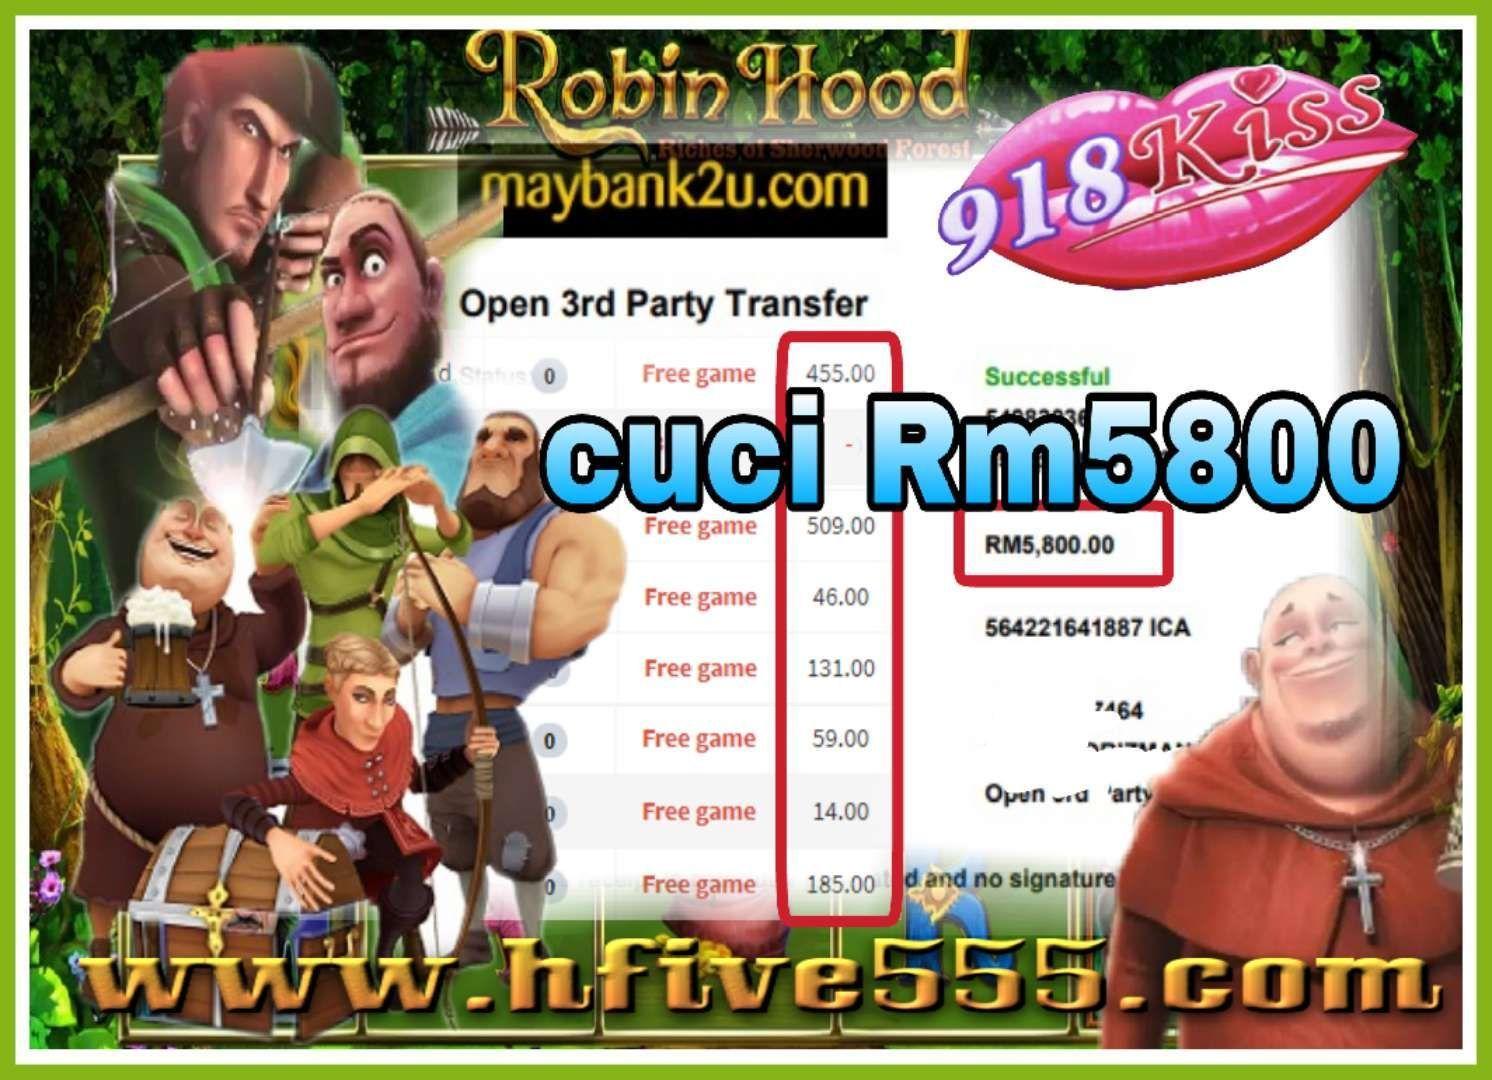 Pin on 918kiss Percuma Free Kredit RM30 918kiss Malaysia